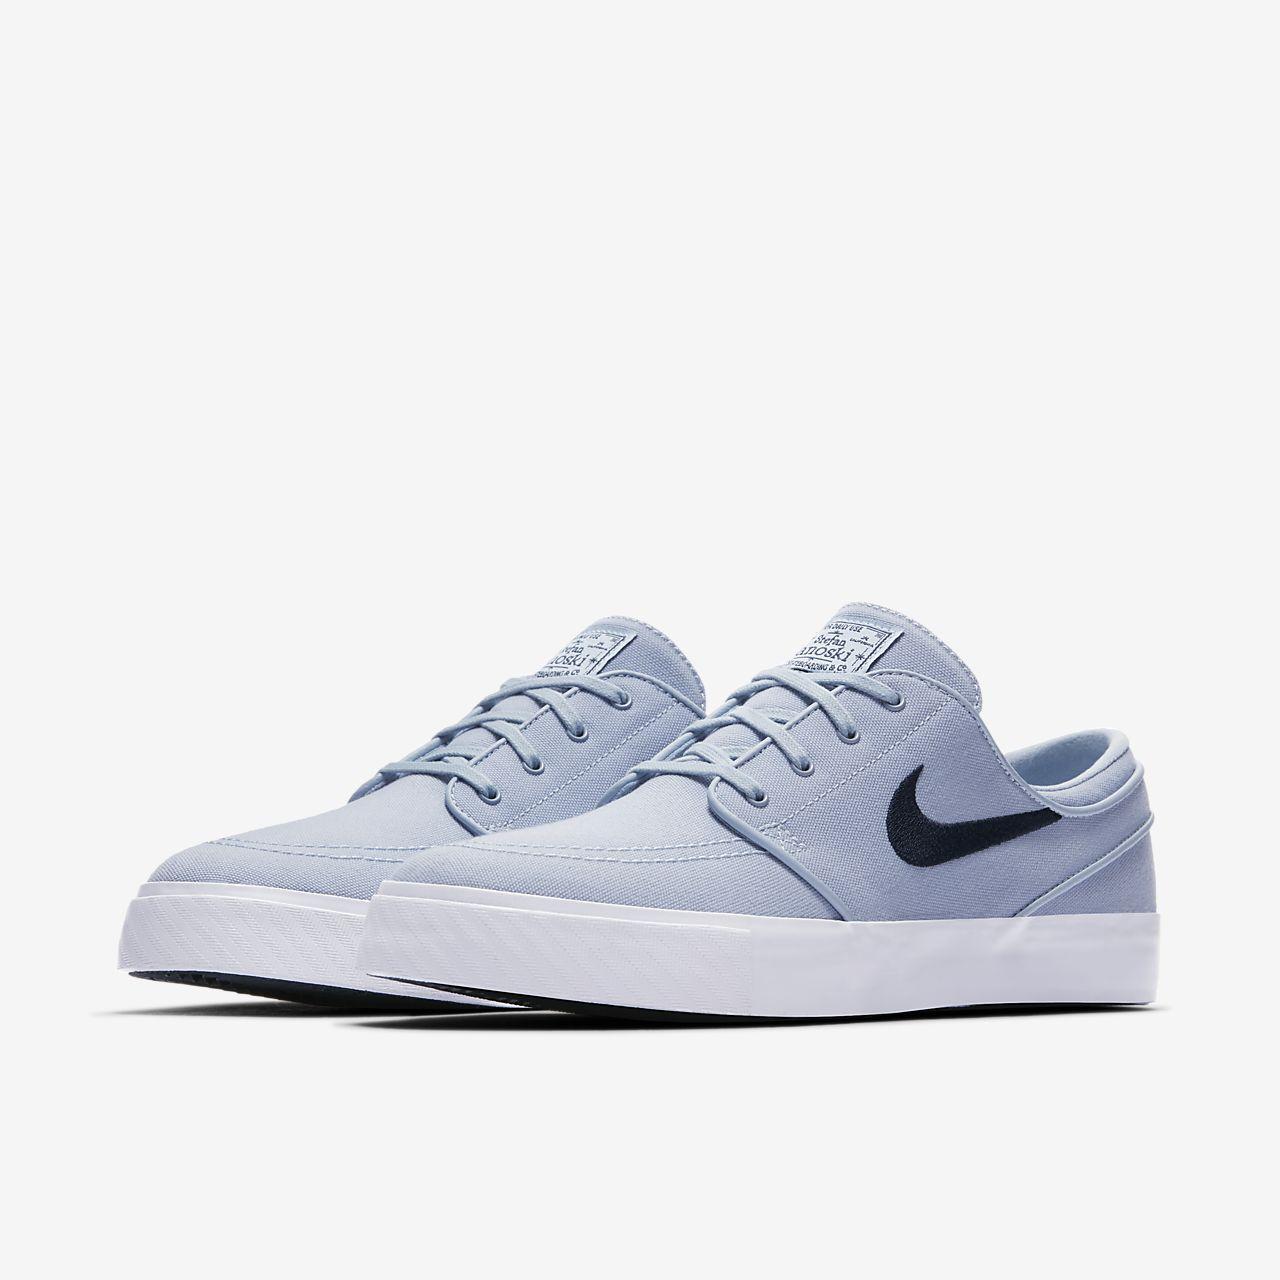 aberdeen Nike Sb Zoom Stefan Chaussures Janoski Toile Hommes jeu profiter Footlocker Finishline ItTADo7